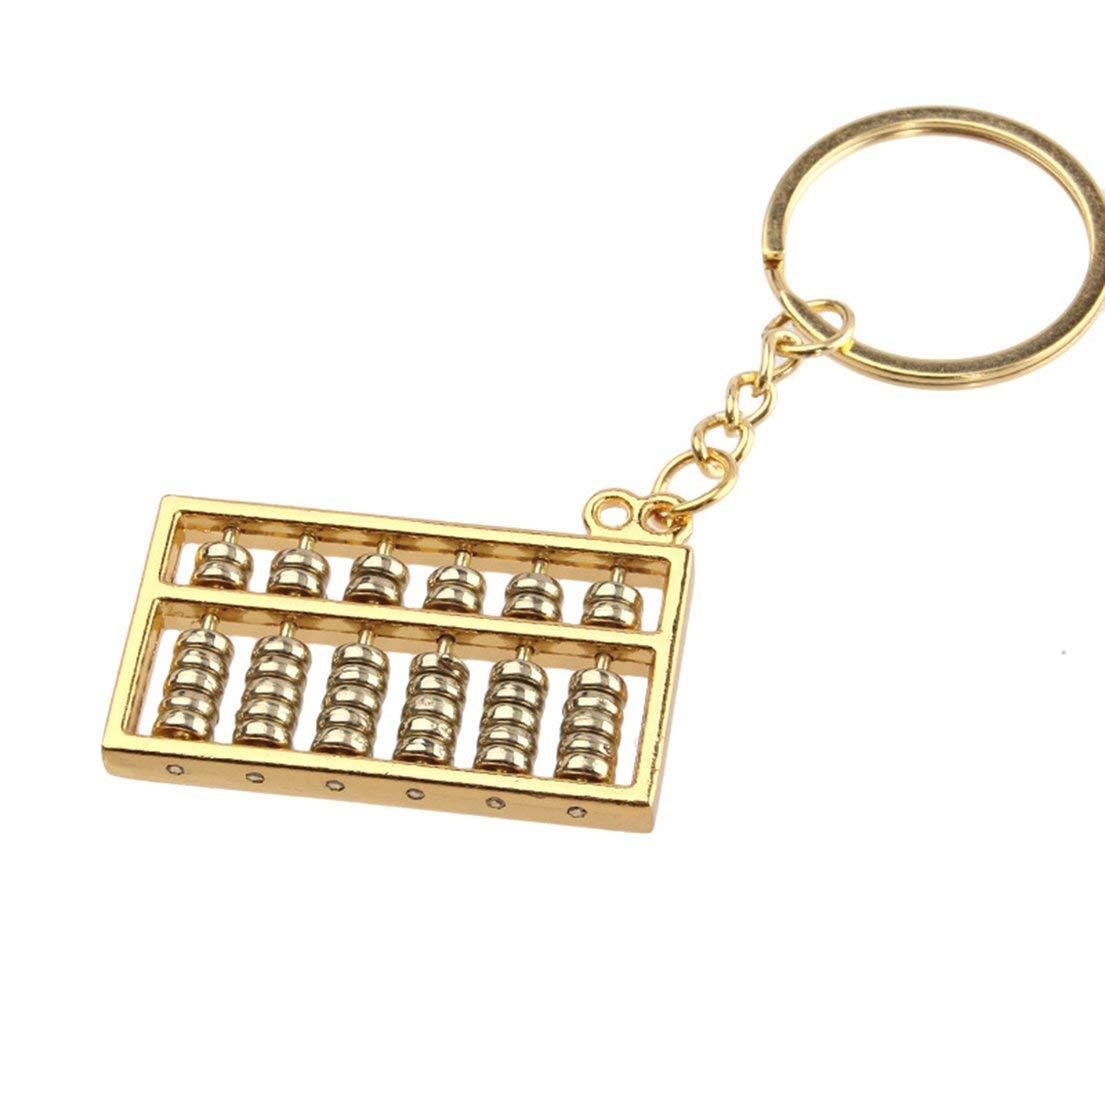 Kleine 6 File Metal Abacus Keychain Gold DFHJS